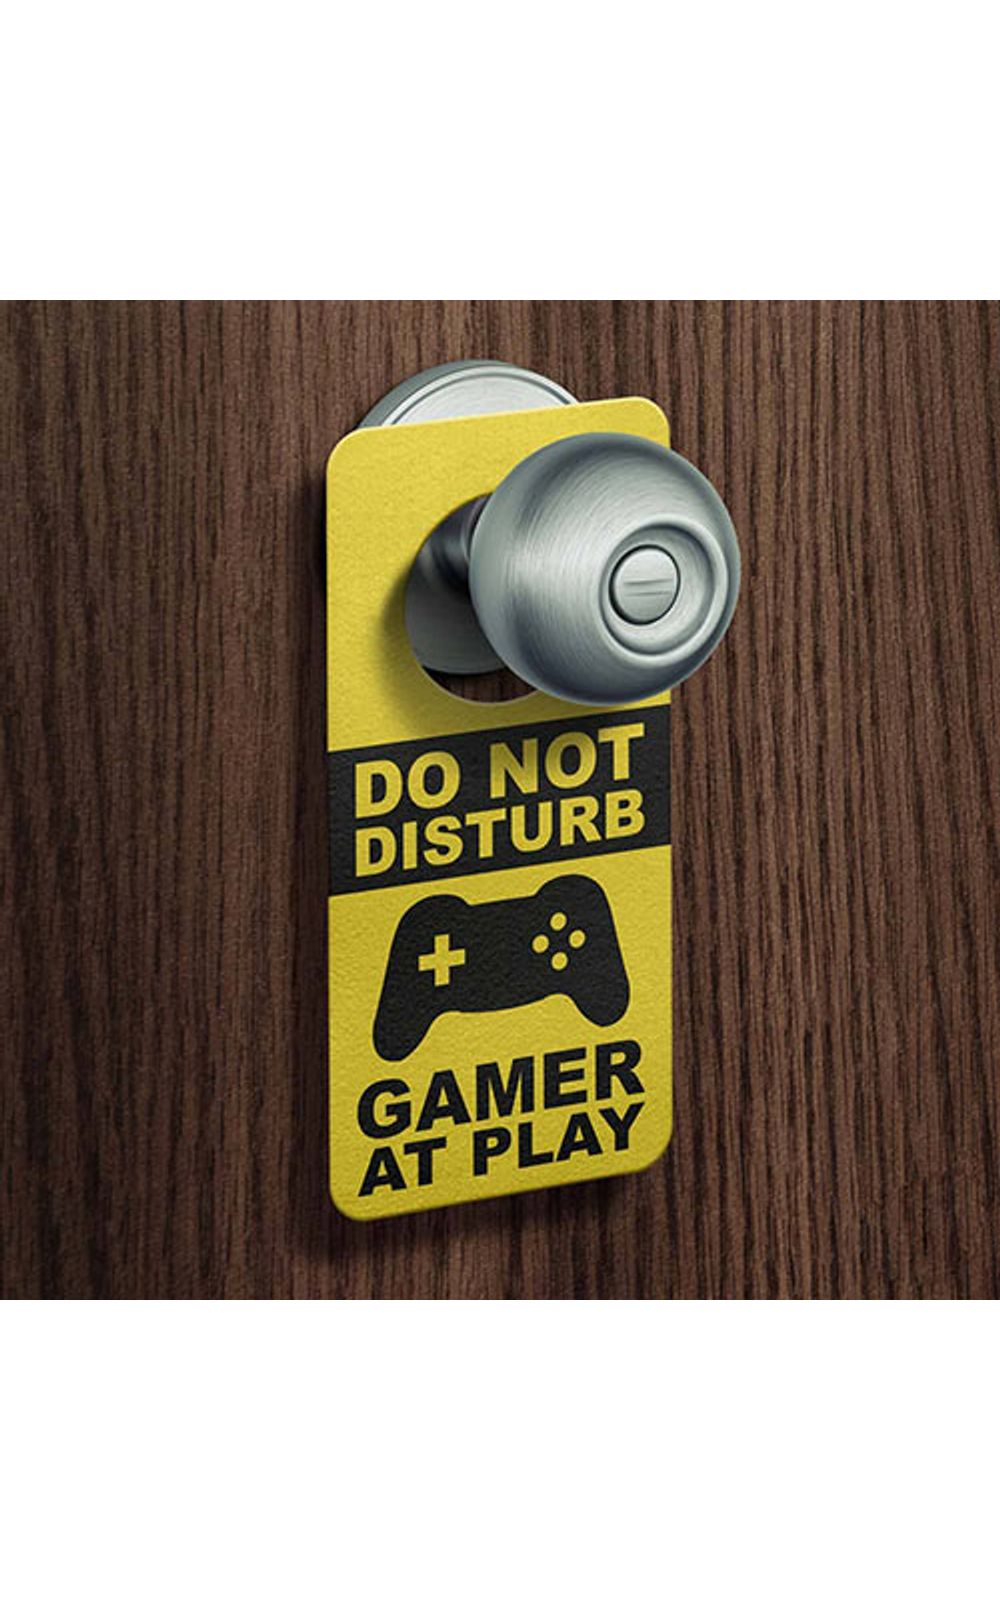 Foto 2 - Aviso de Porta Ecologico Gamer at Play Joystick